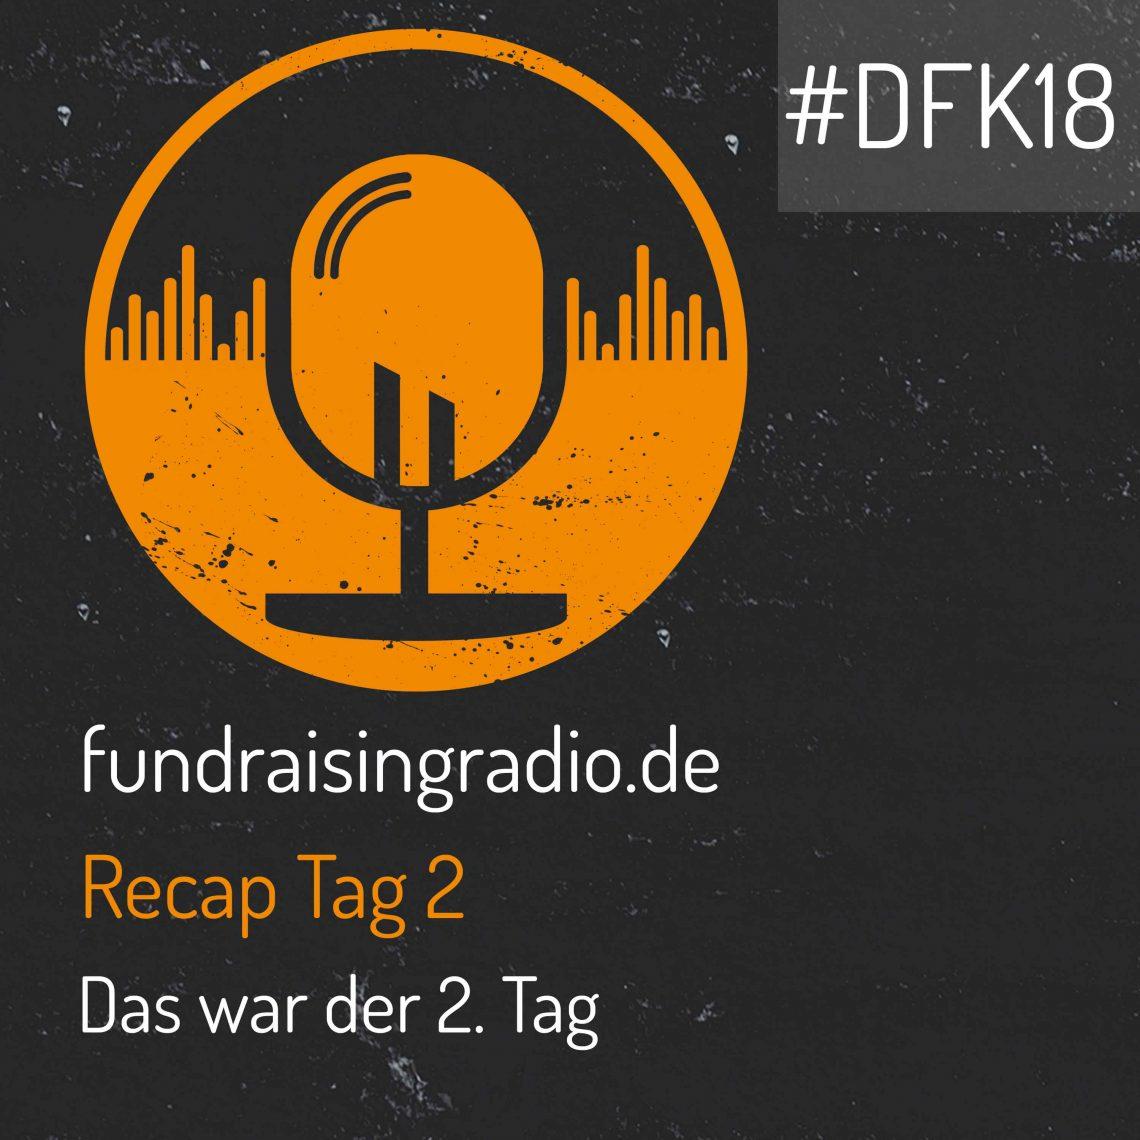 FRR: Recap 2. Tag vom #DFK18